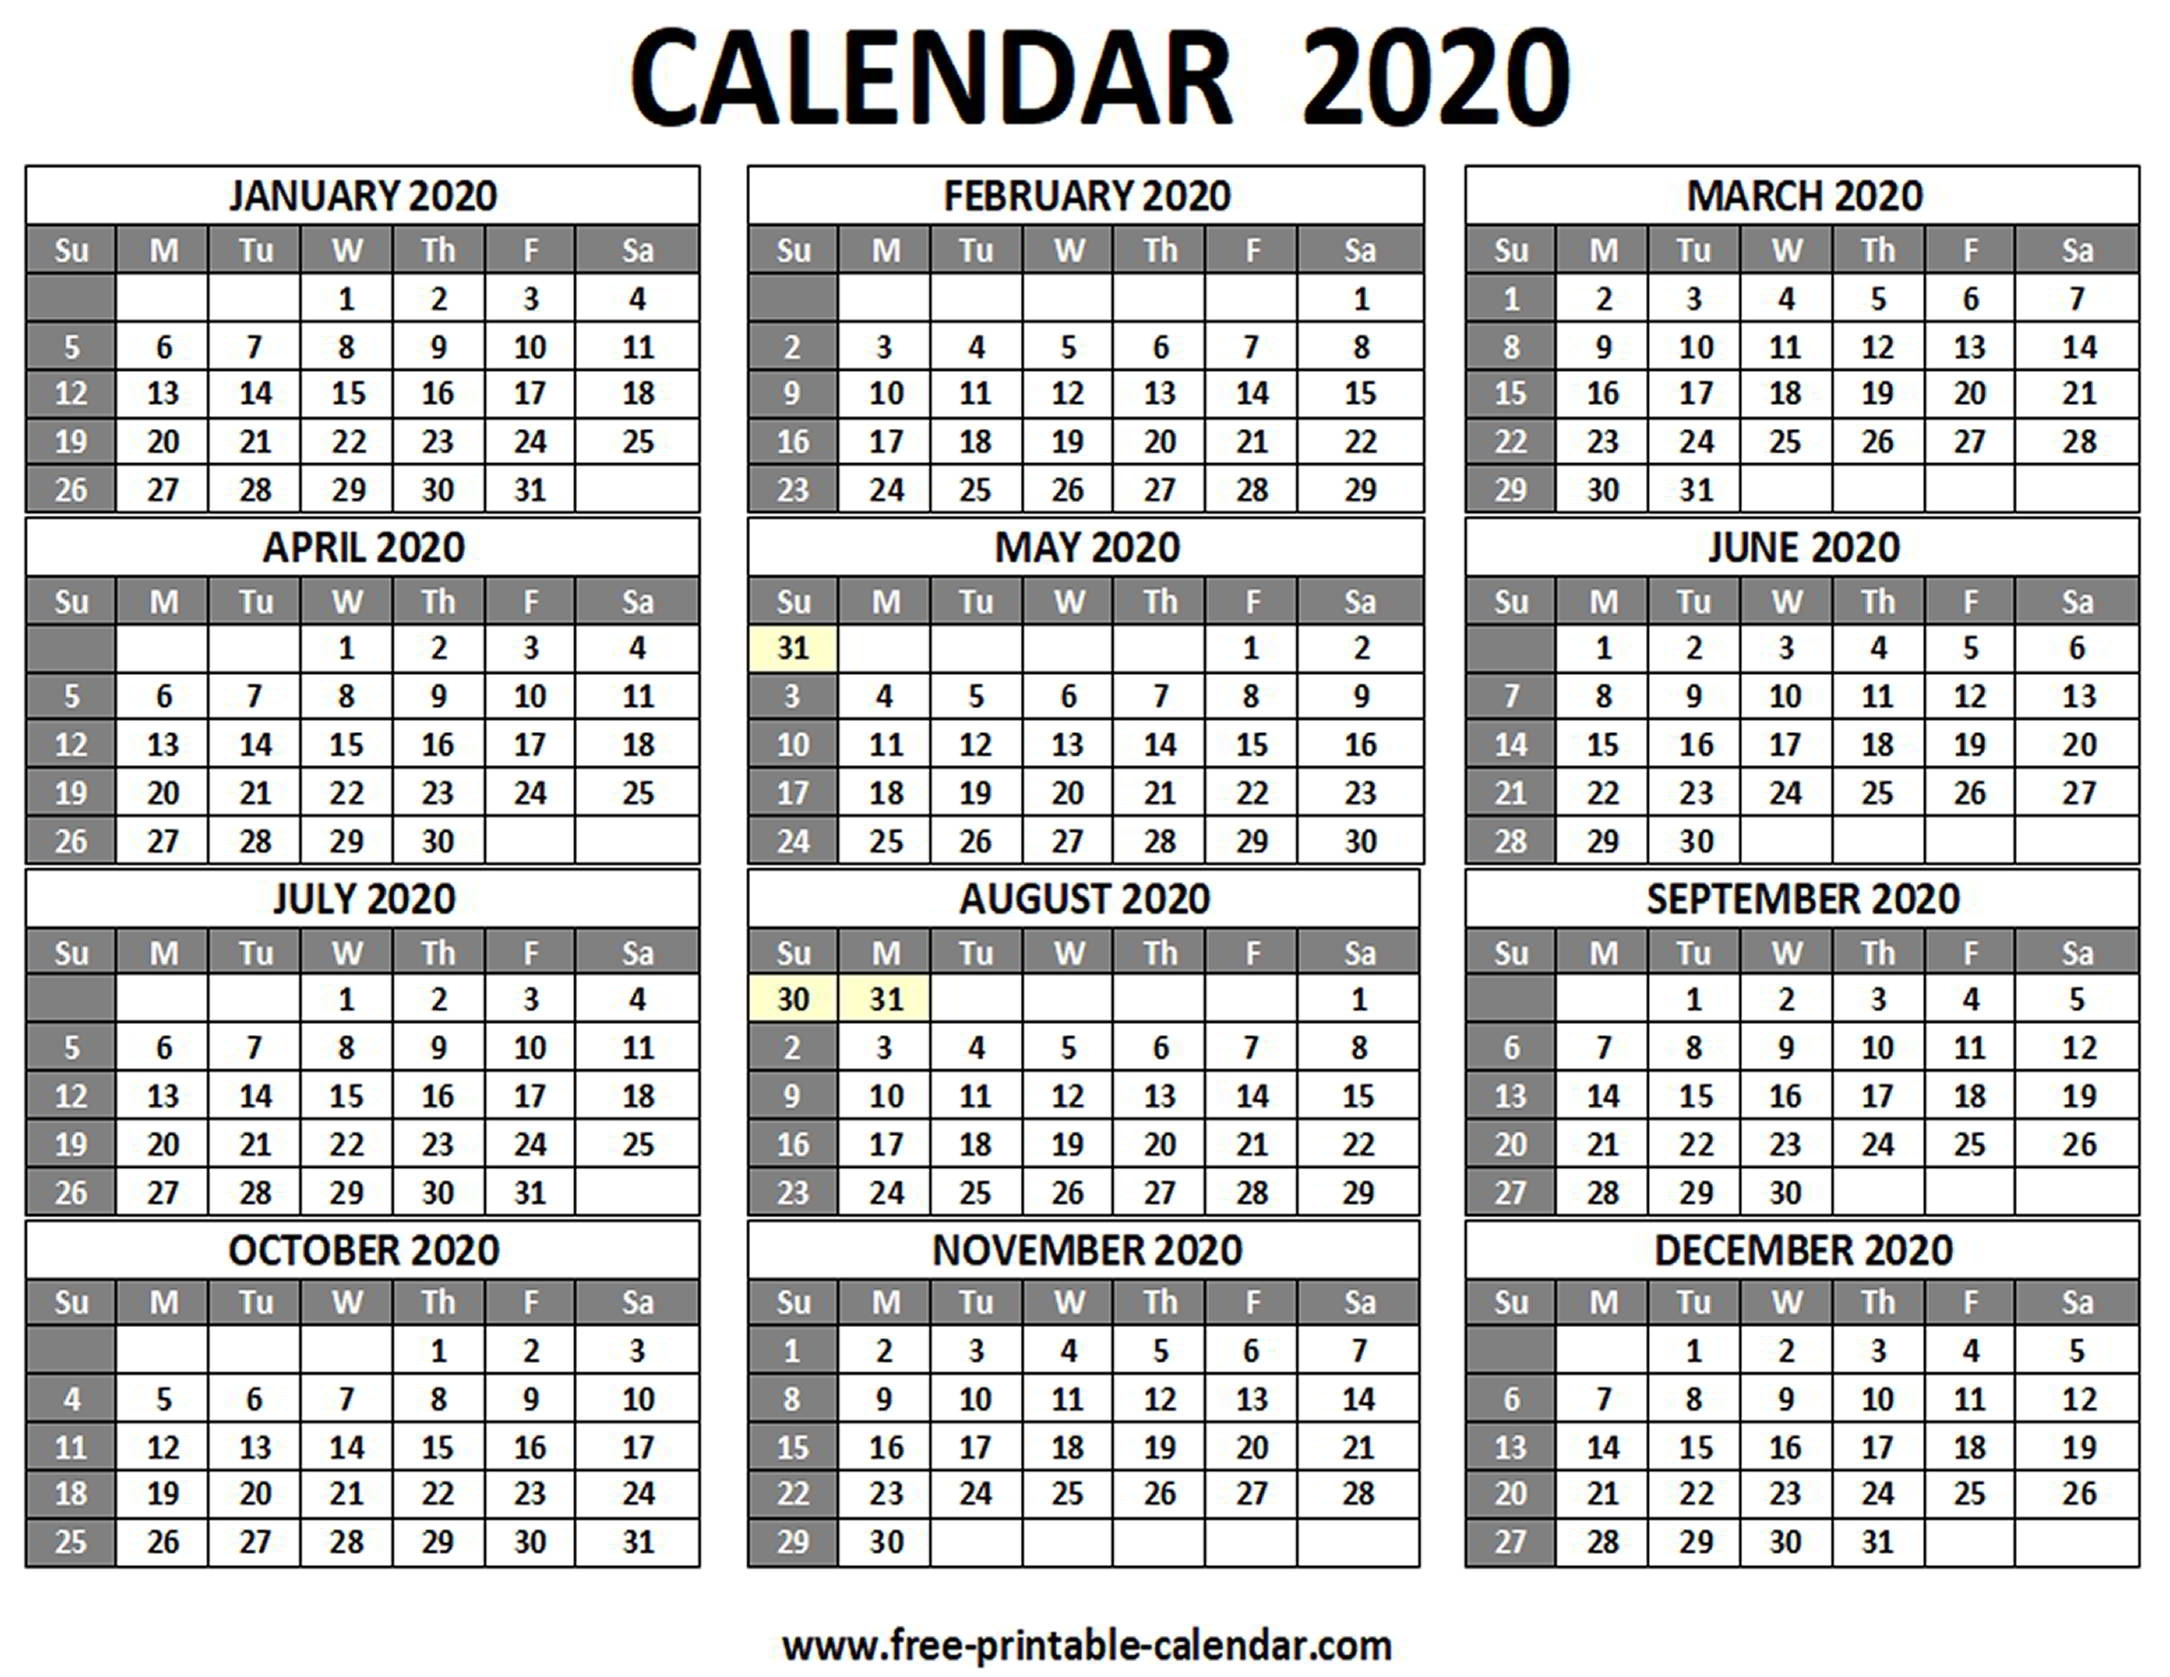 Printable 2020 Calendar - Free-Printable-Calendar regarding 2020 Calendar Printable One Page